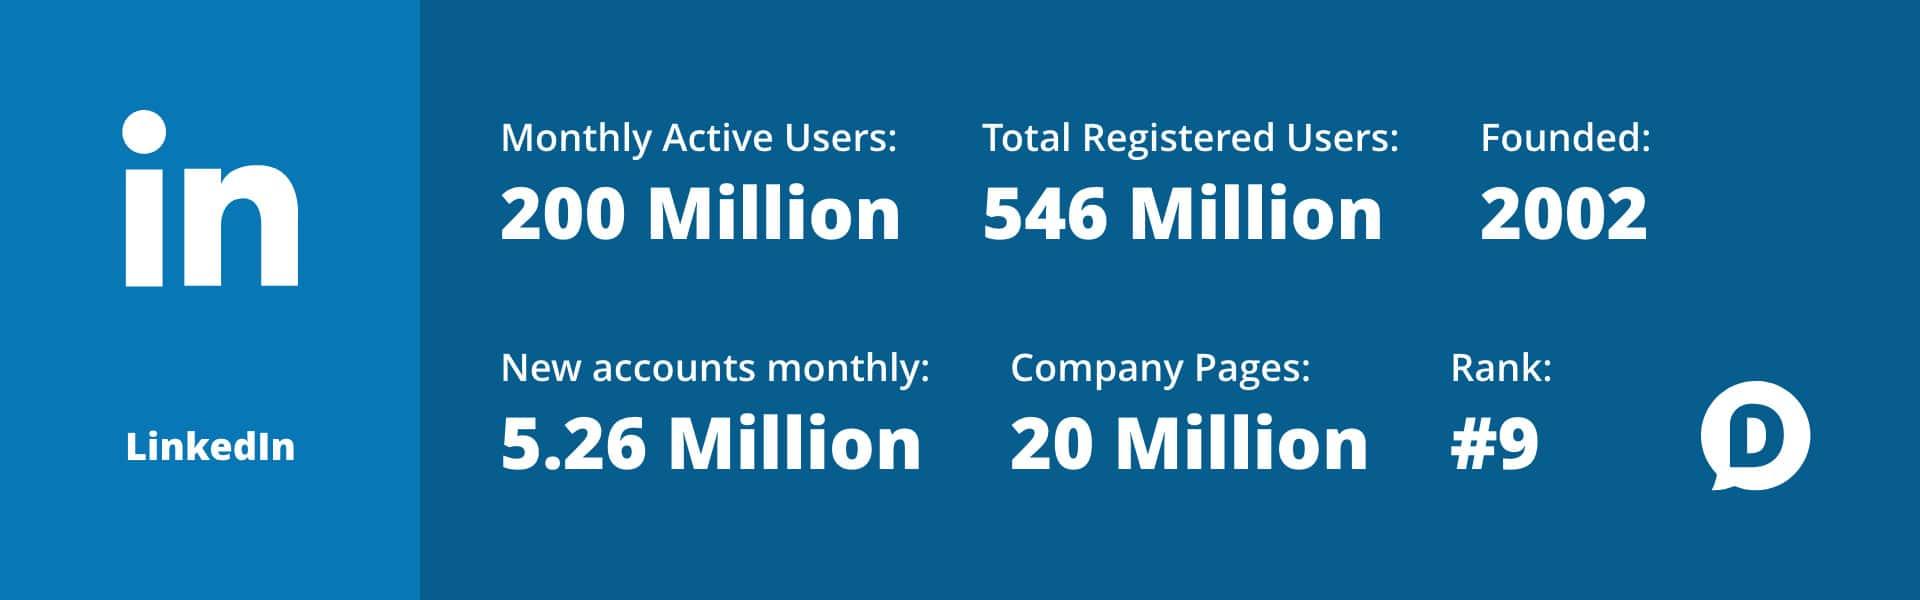 LinkedIn statistics for 2018